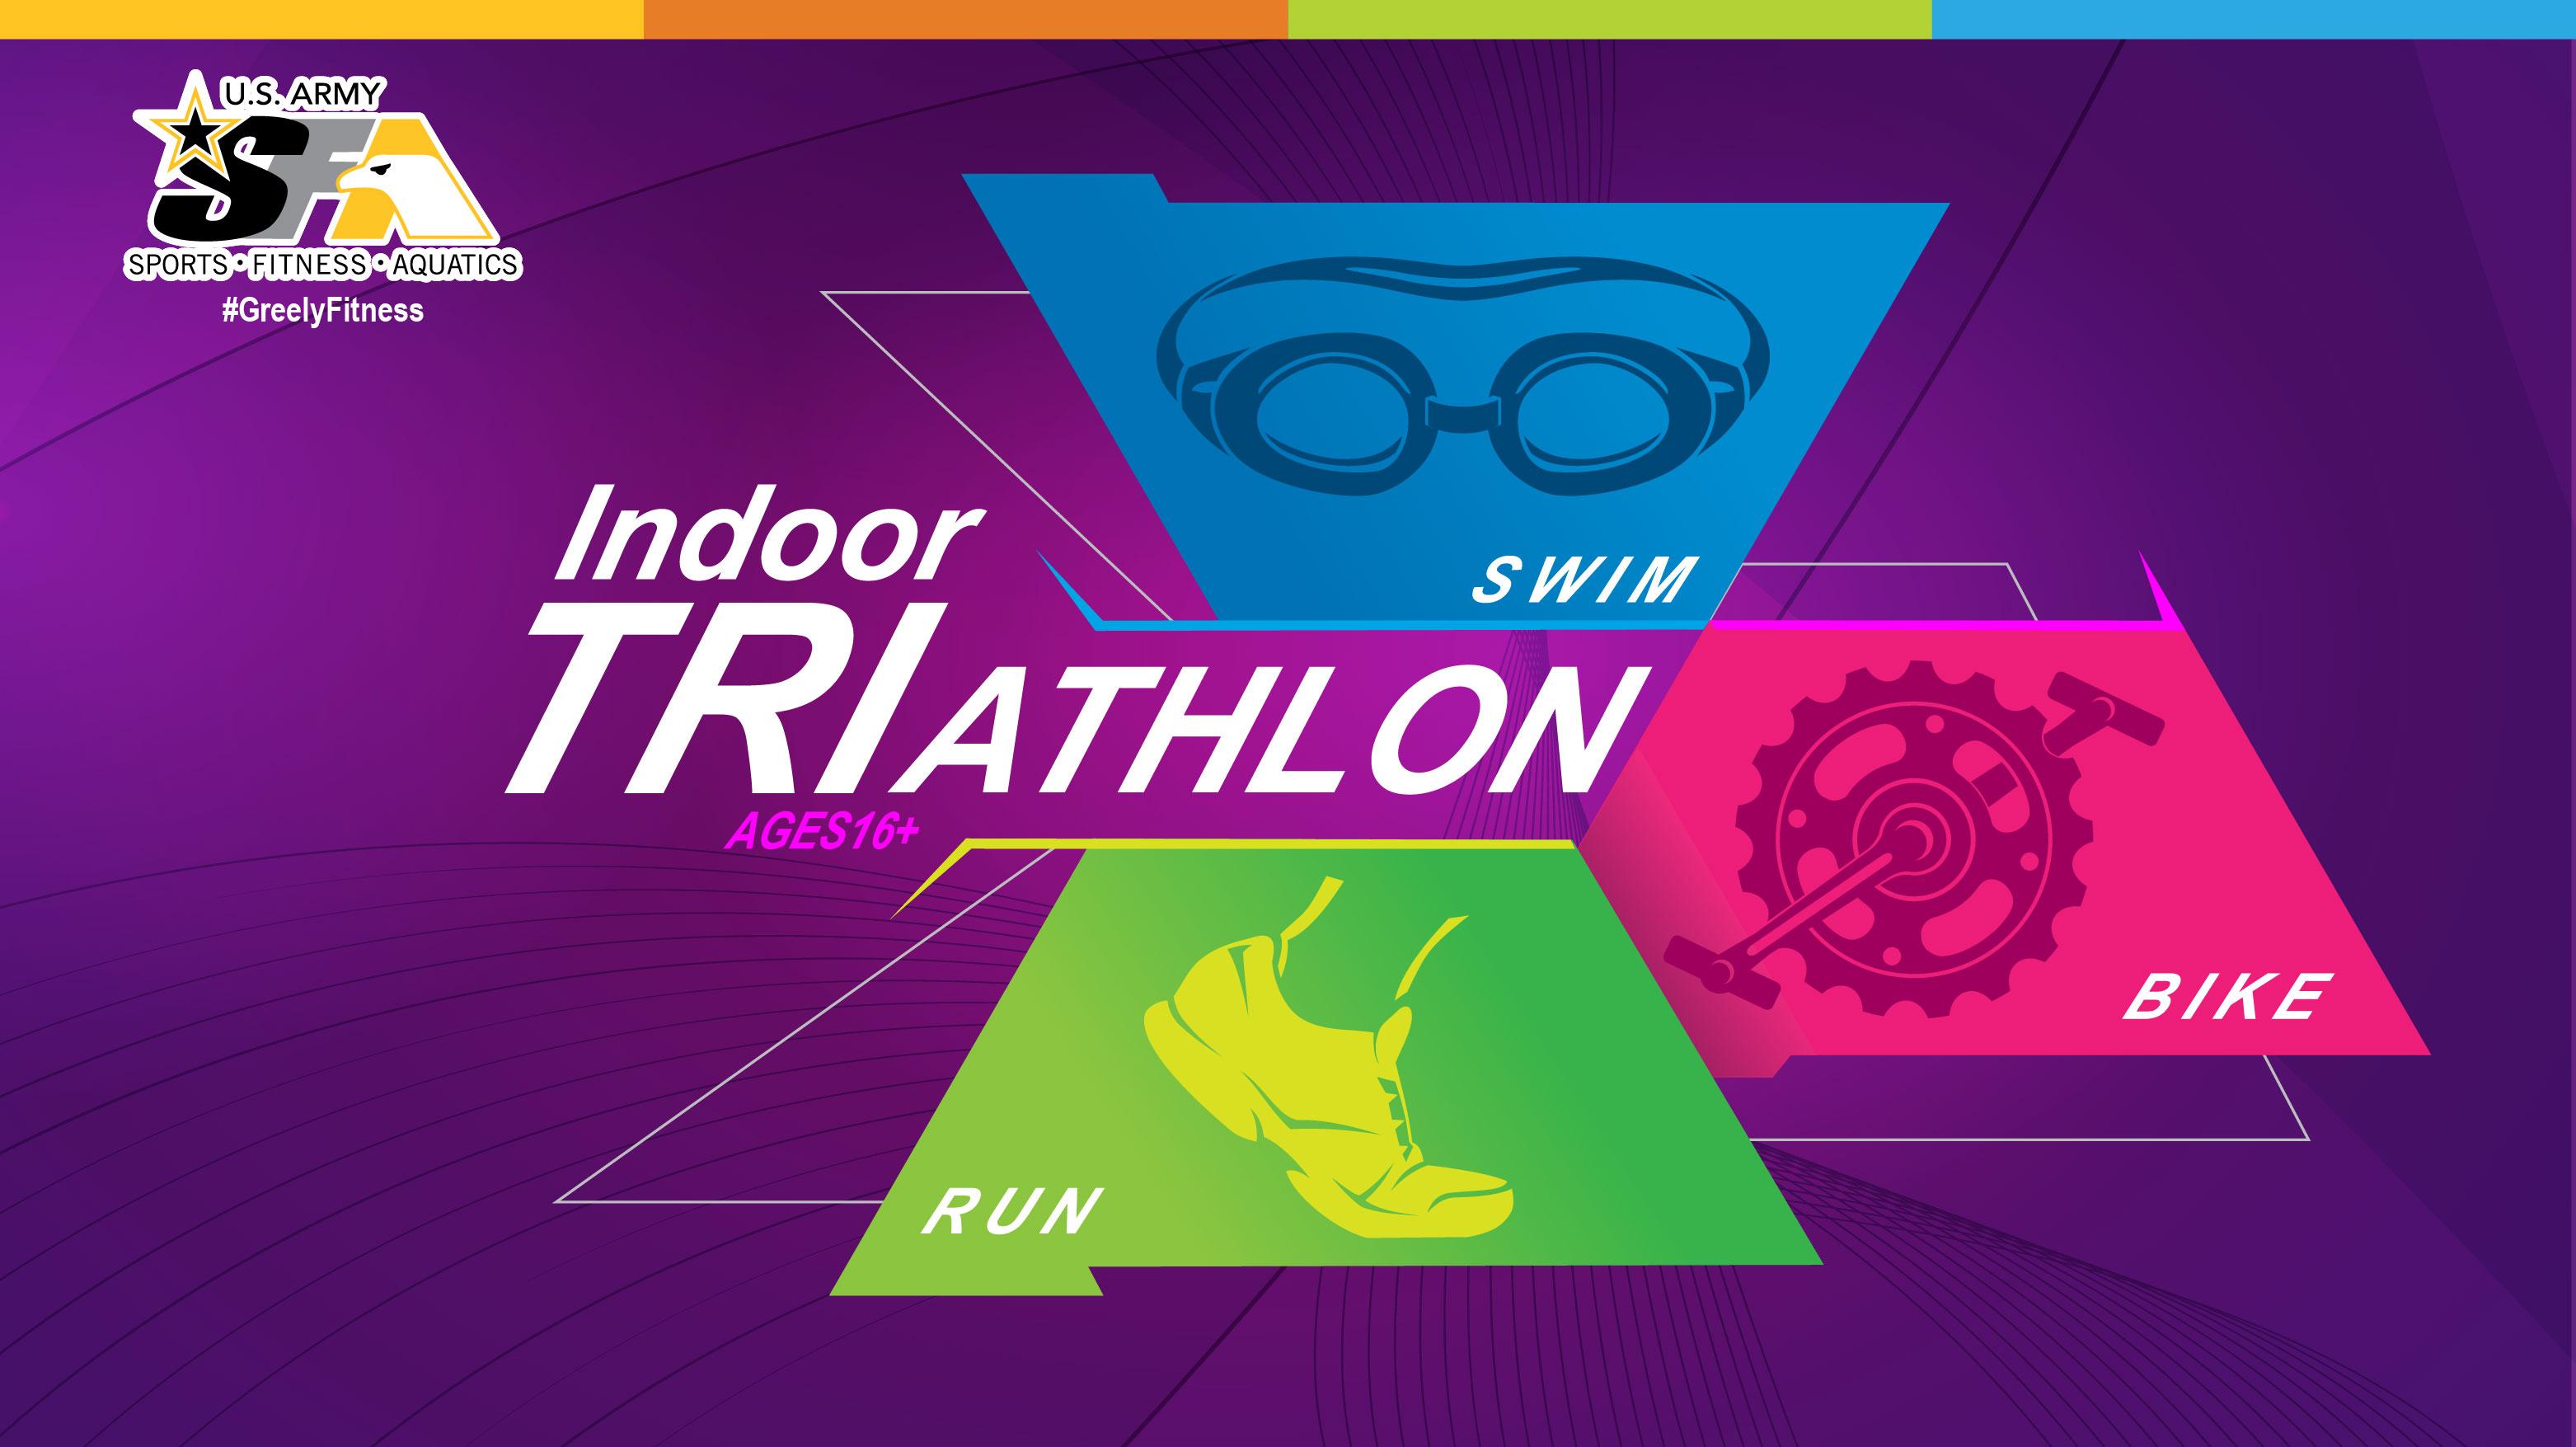 20/20/20 Indoor Triathlon